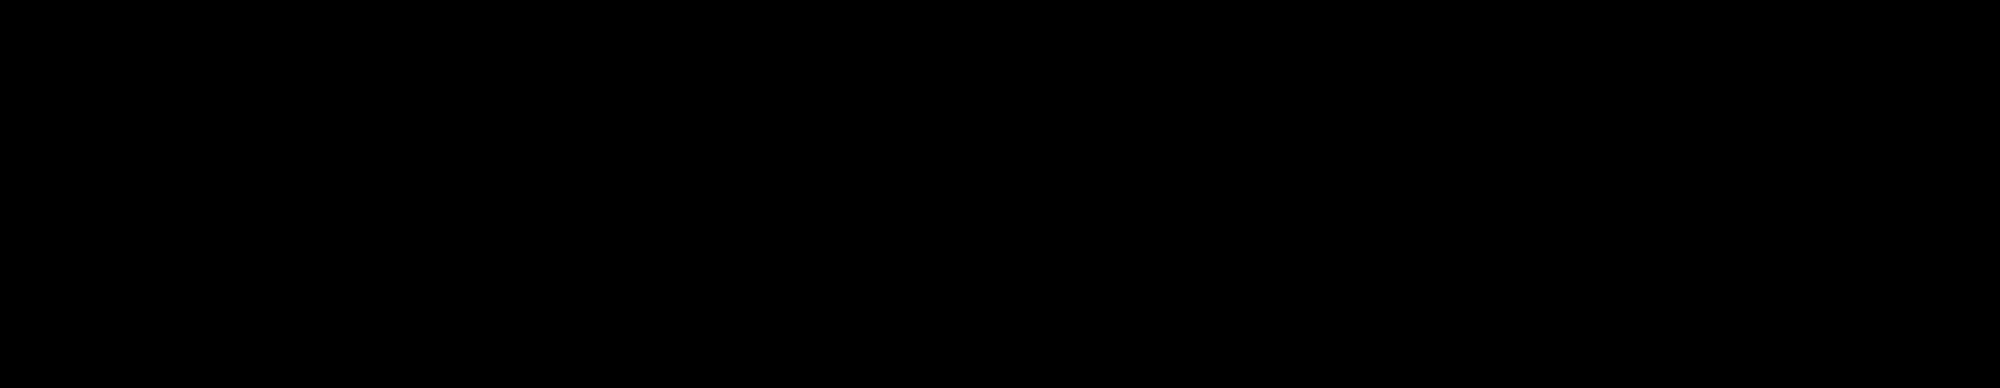 Open PlusPng.com  - Logo Aenor Black PNG